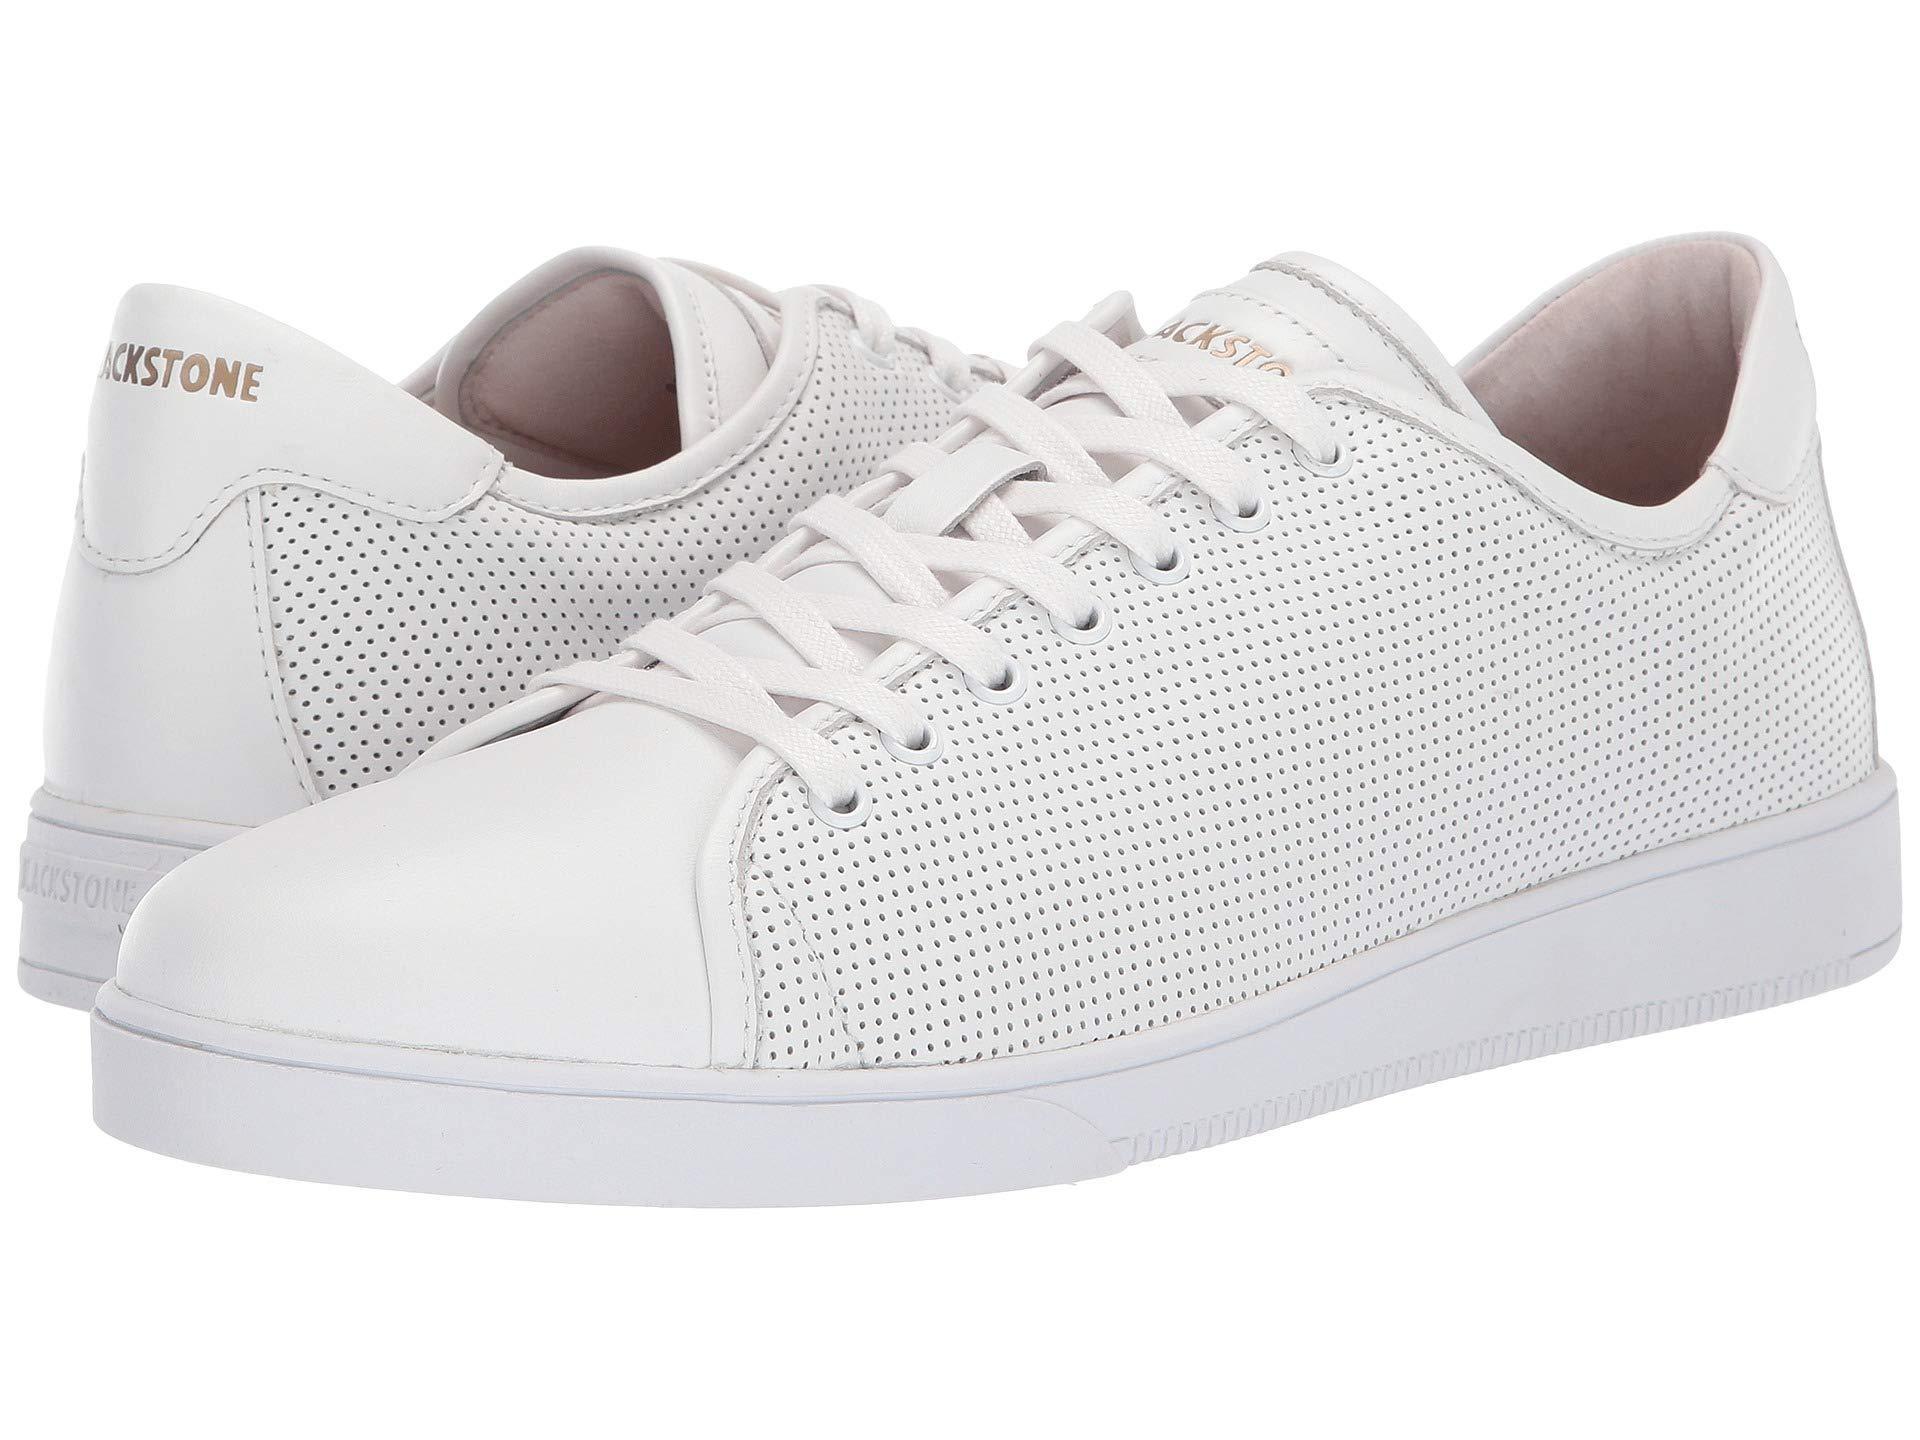 Blackstone Leather Low Sneaker Perf